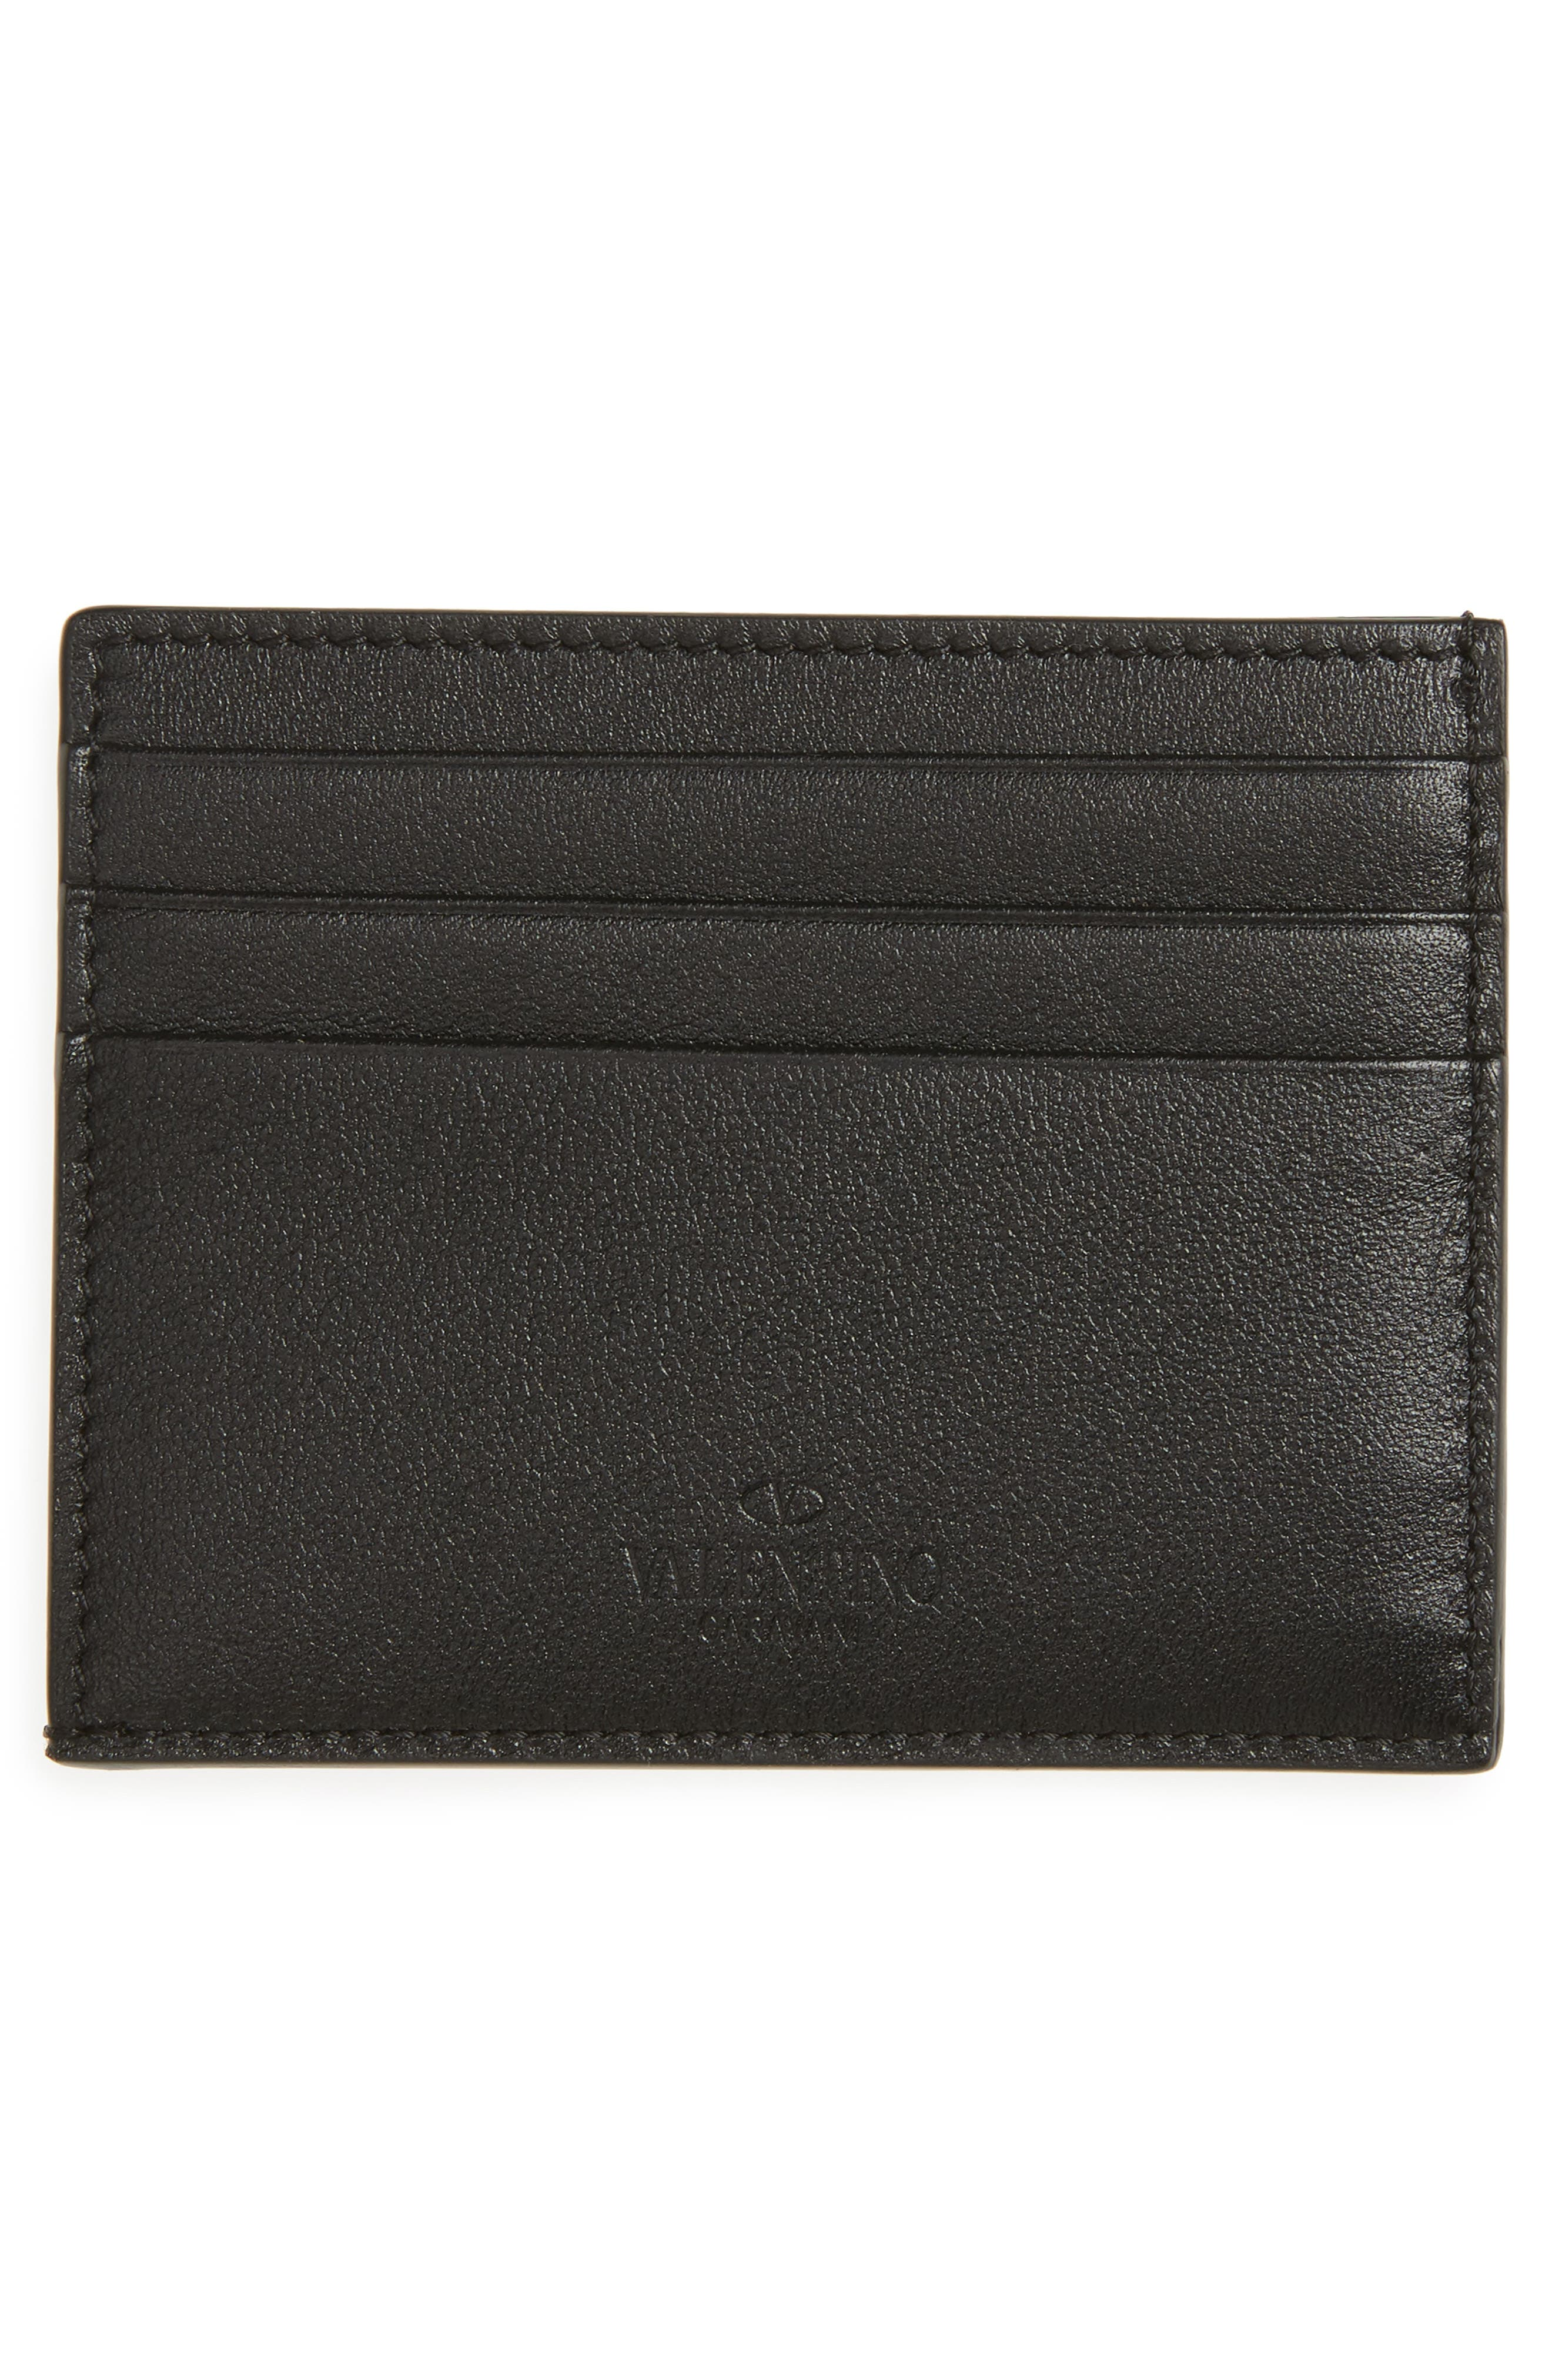 GARAVANI Mini Rock Stud Leather Card Case,                             Alternate thumbnail 2, color,                             001